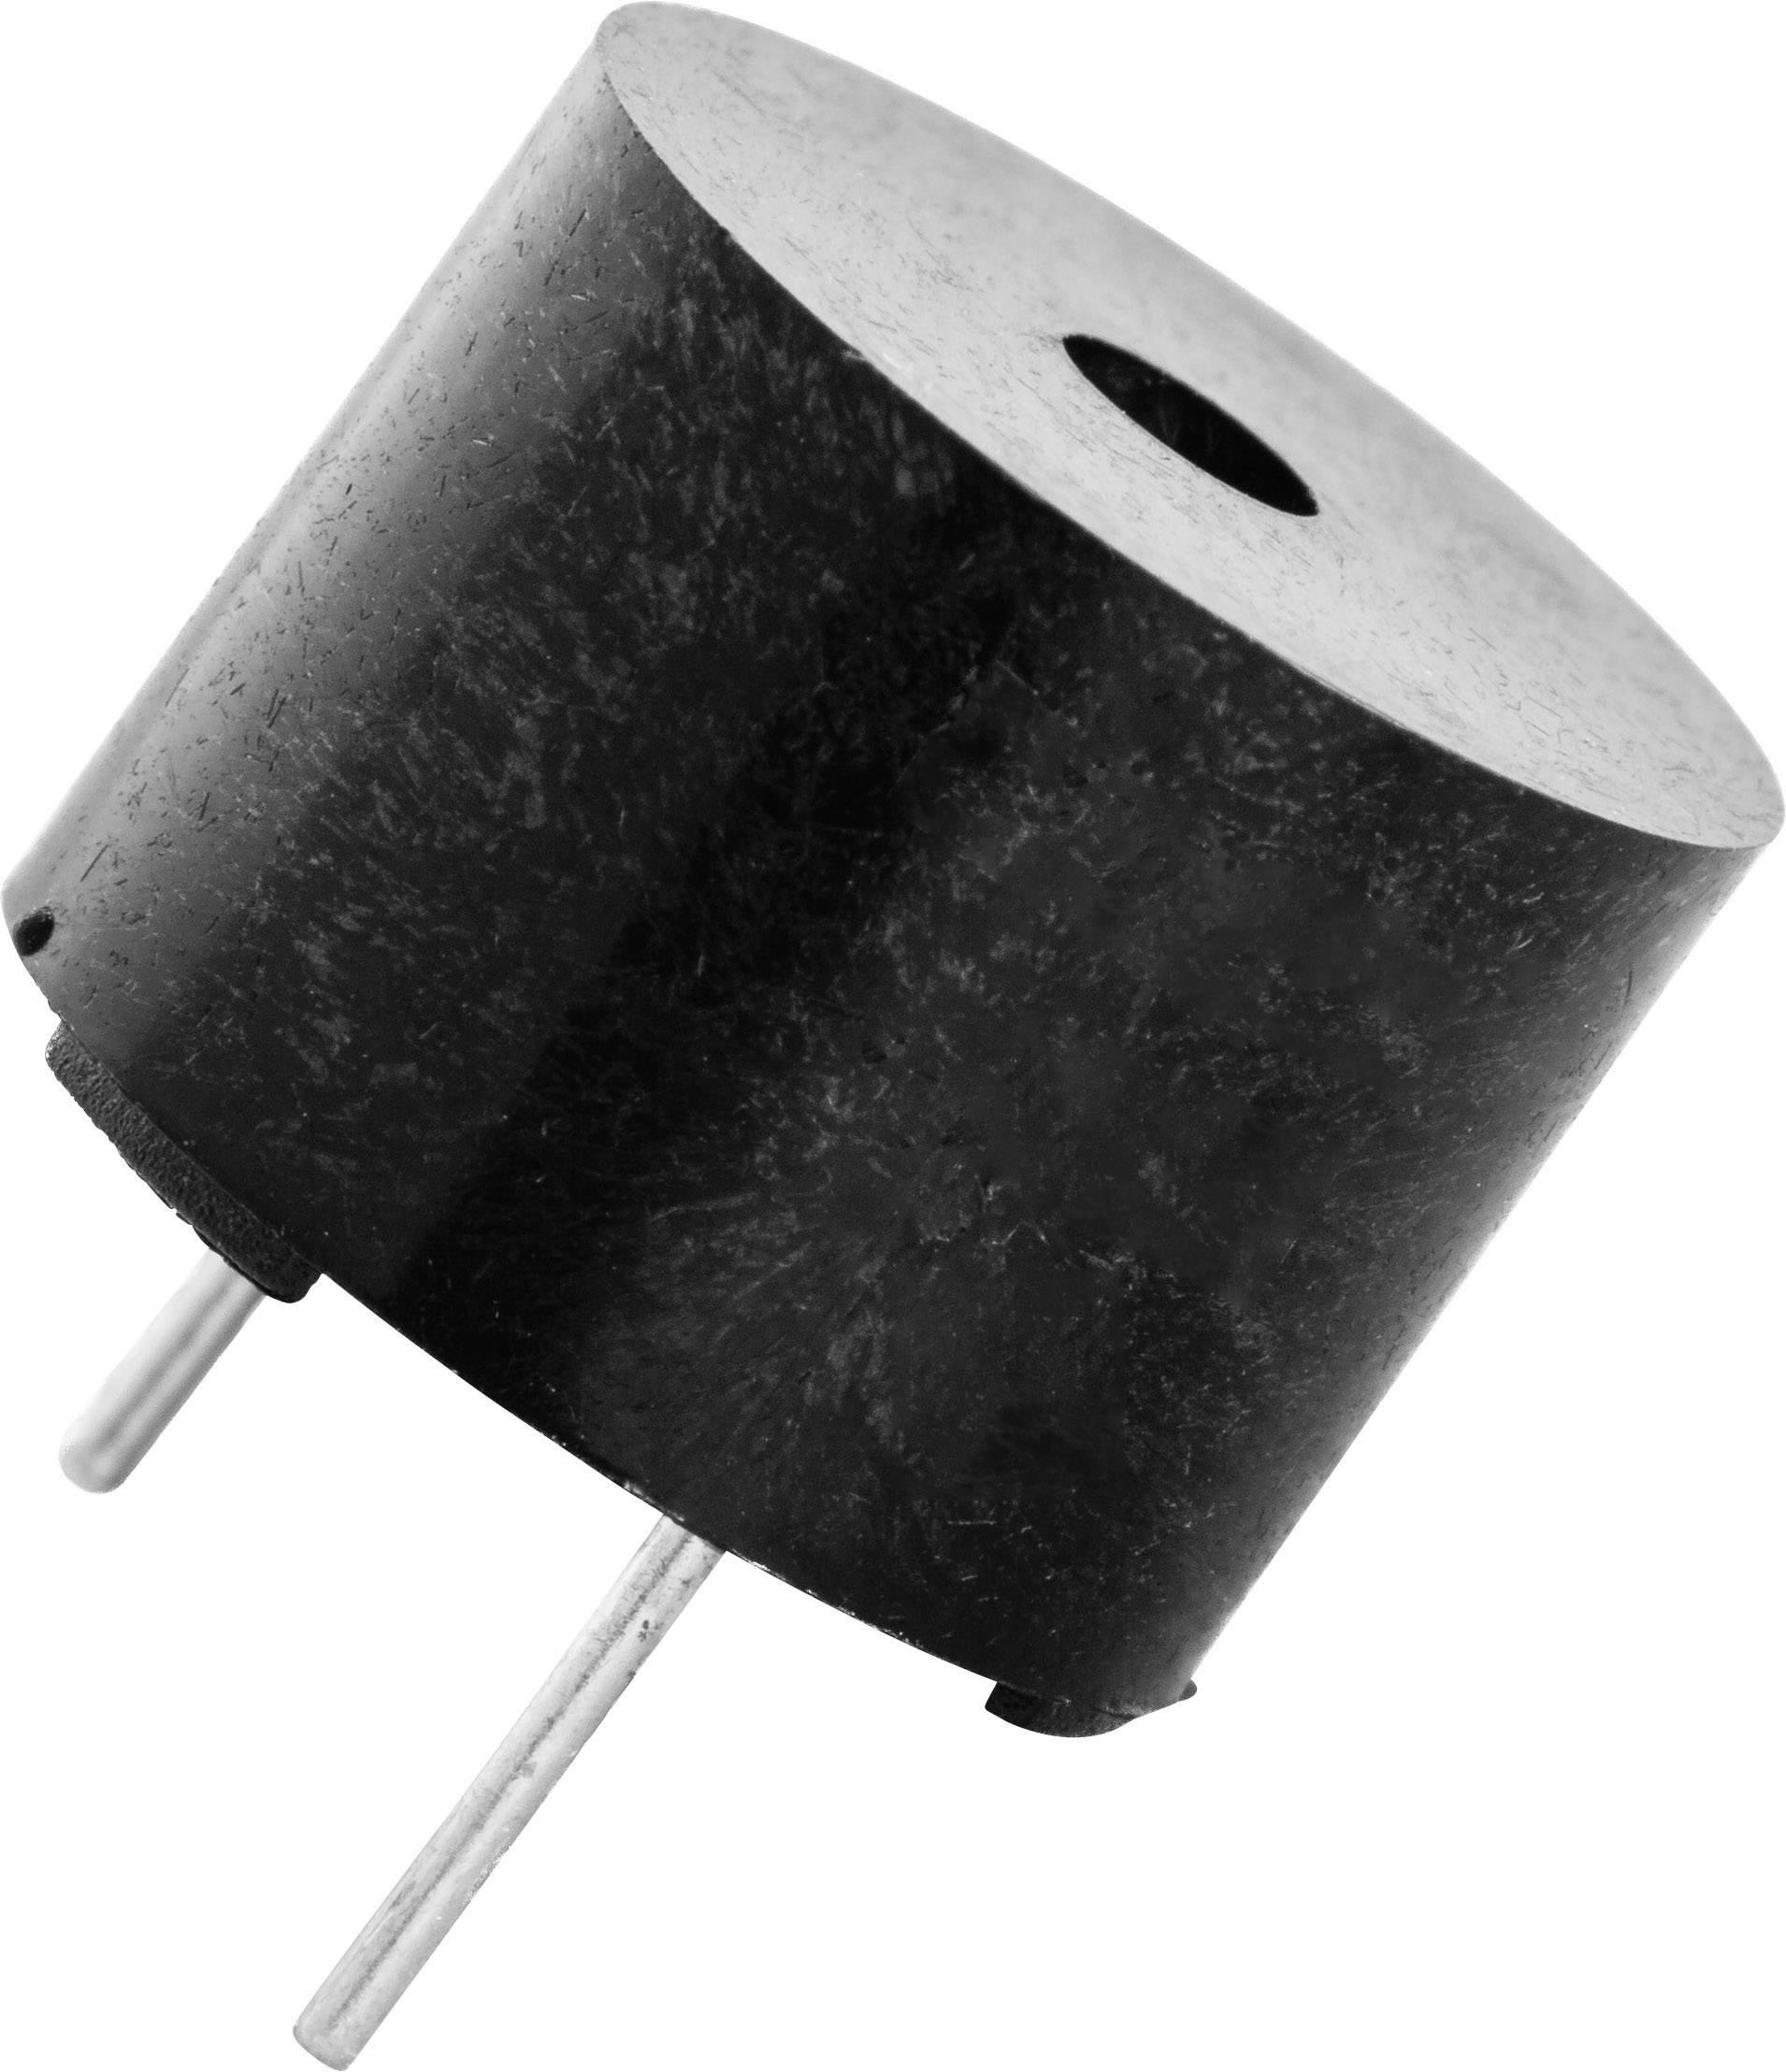 Vysílač signálu s elektronikousérie AL-60SP03